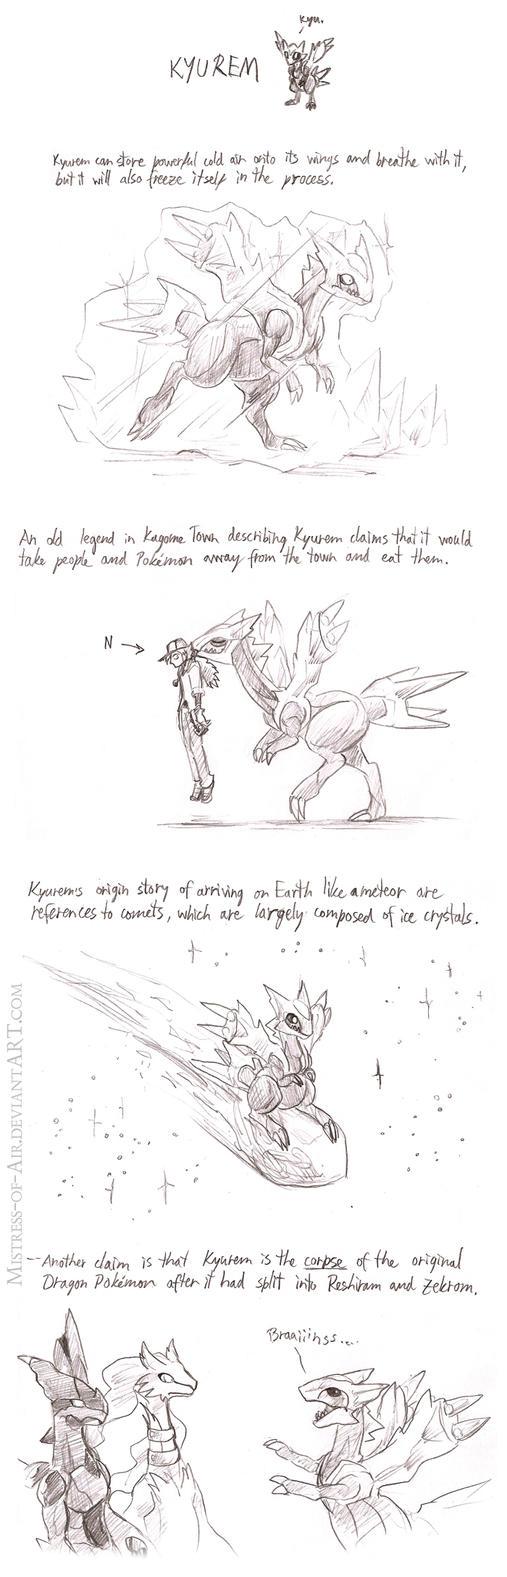 Kyurem, absense Pokemon. by Sysirauta